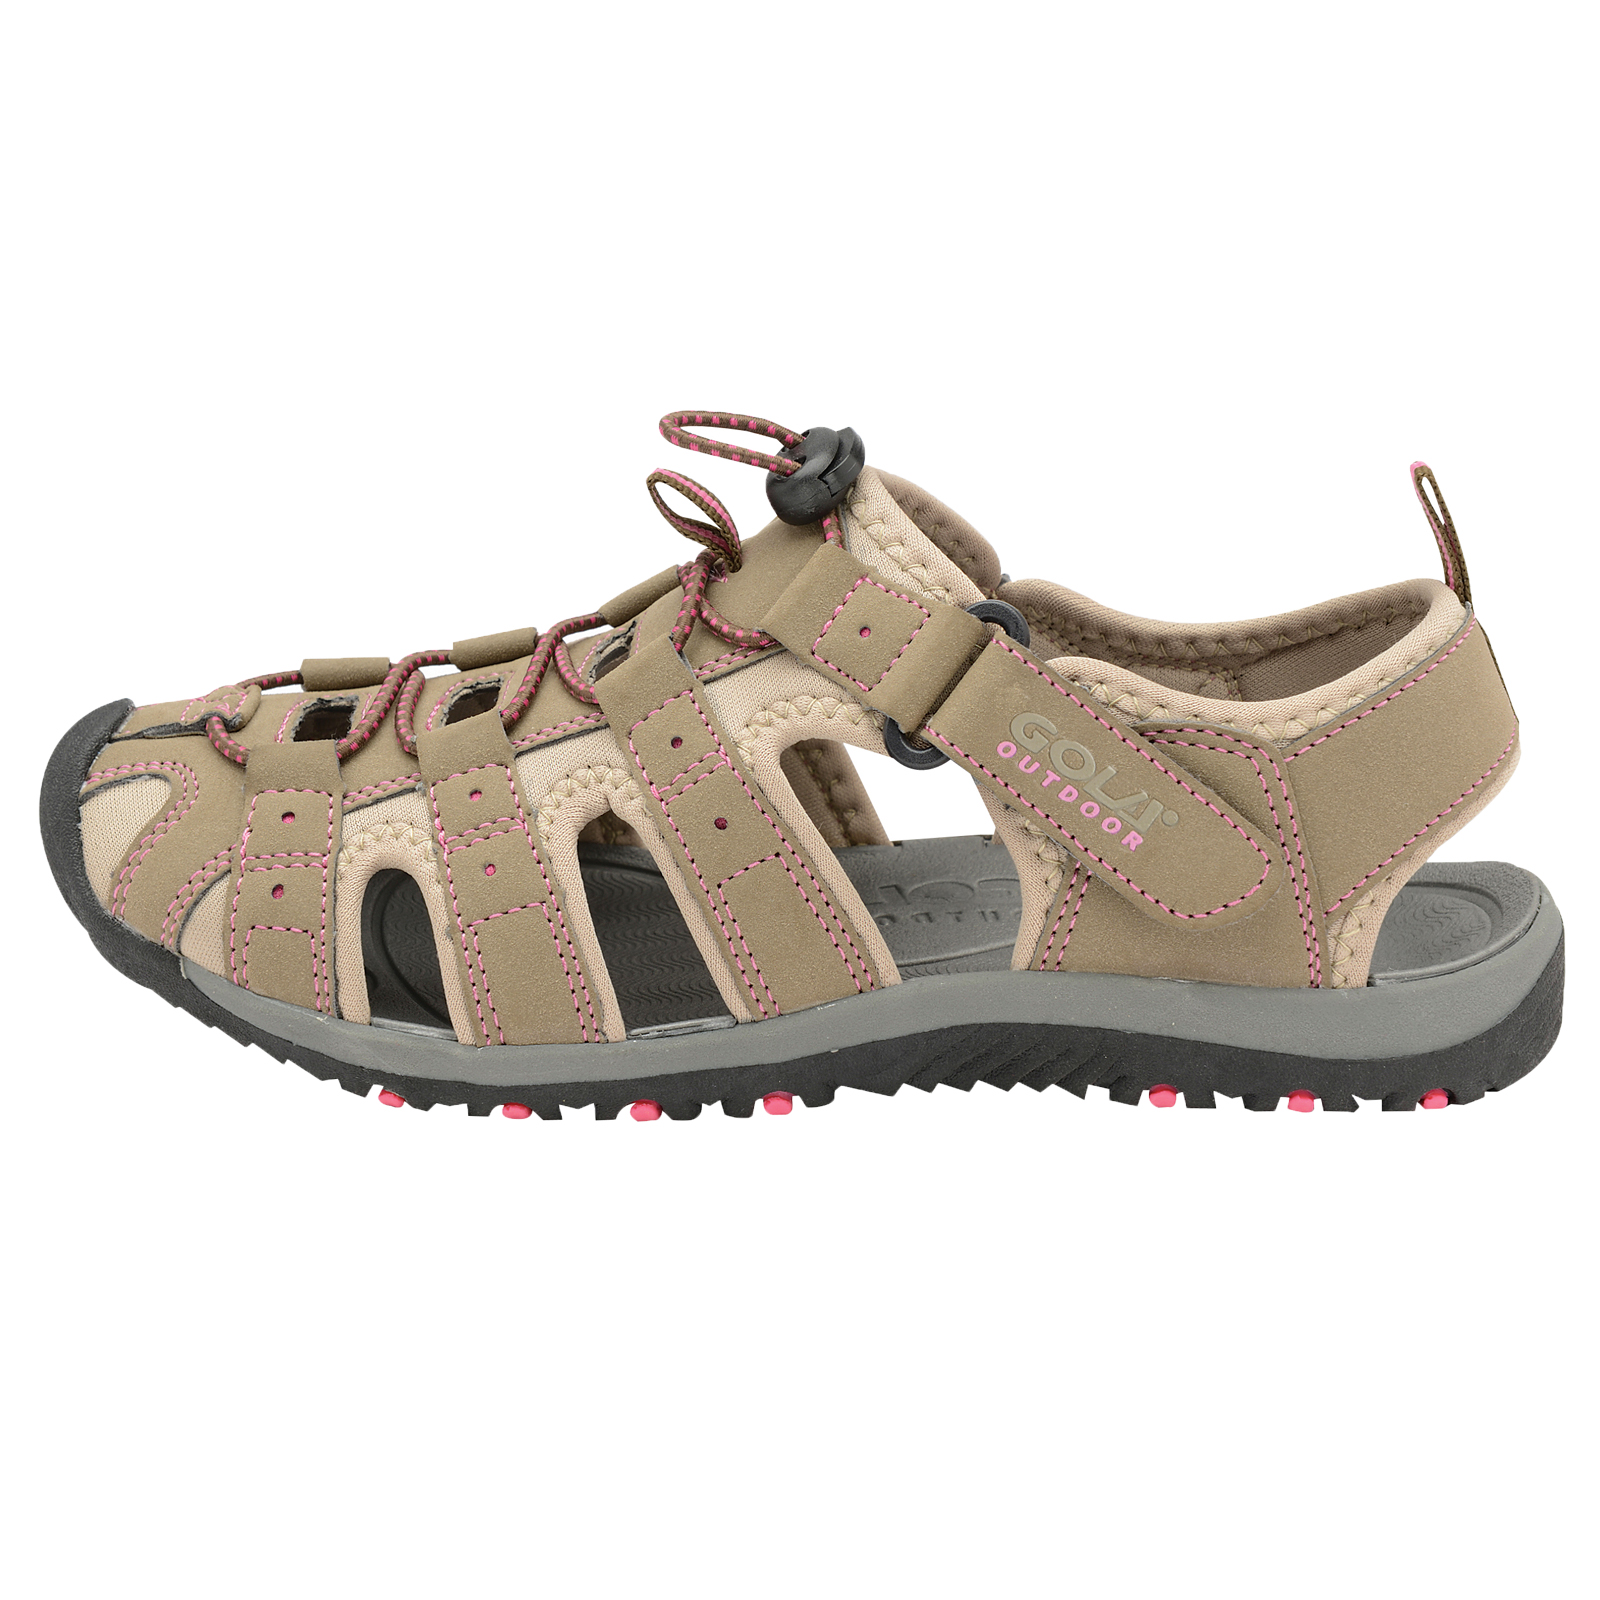 Womens Shingle 3 Athletic Sandals Gola q4qFYP